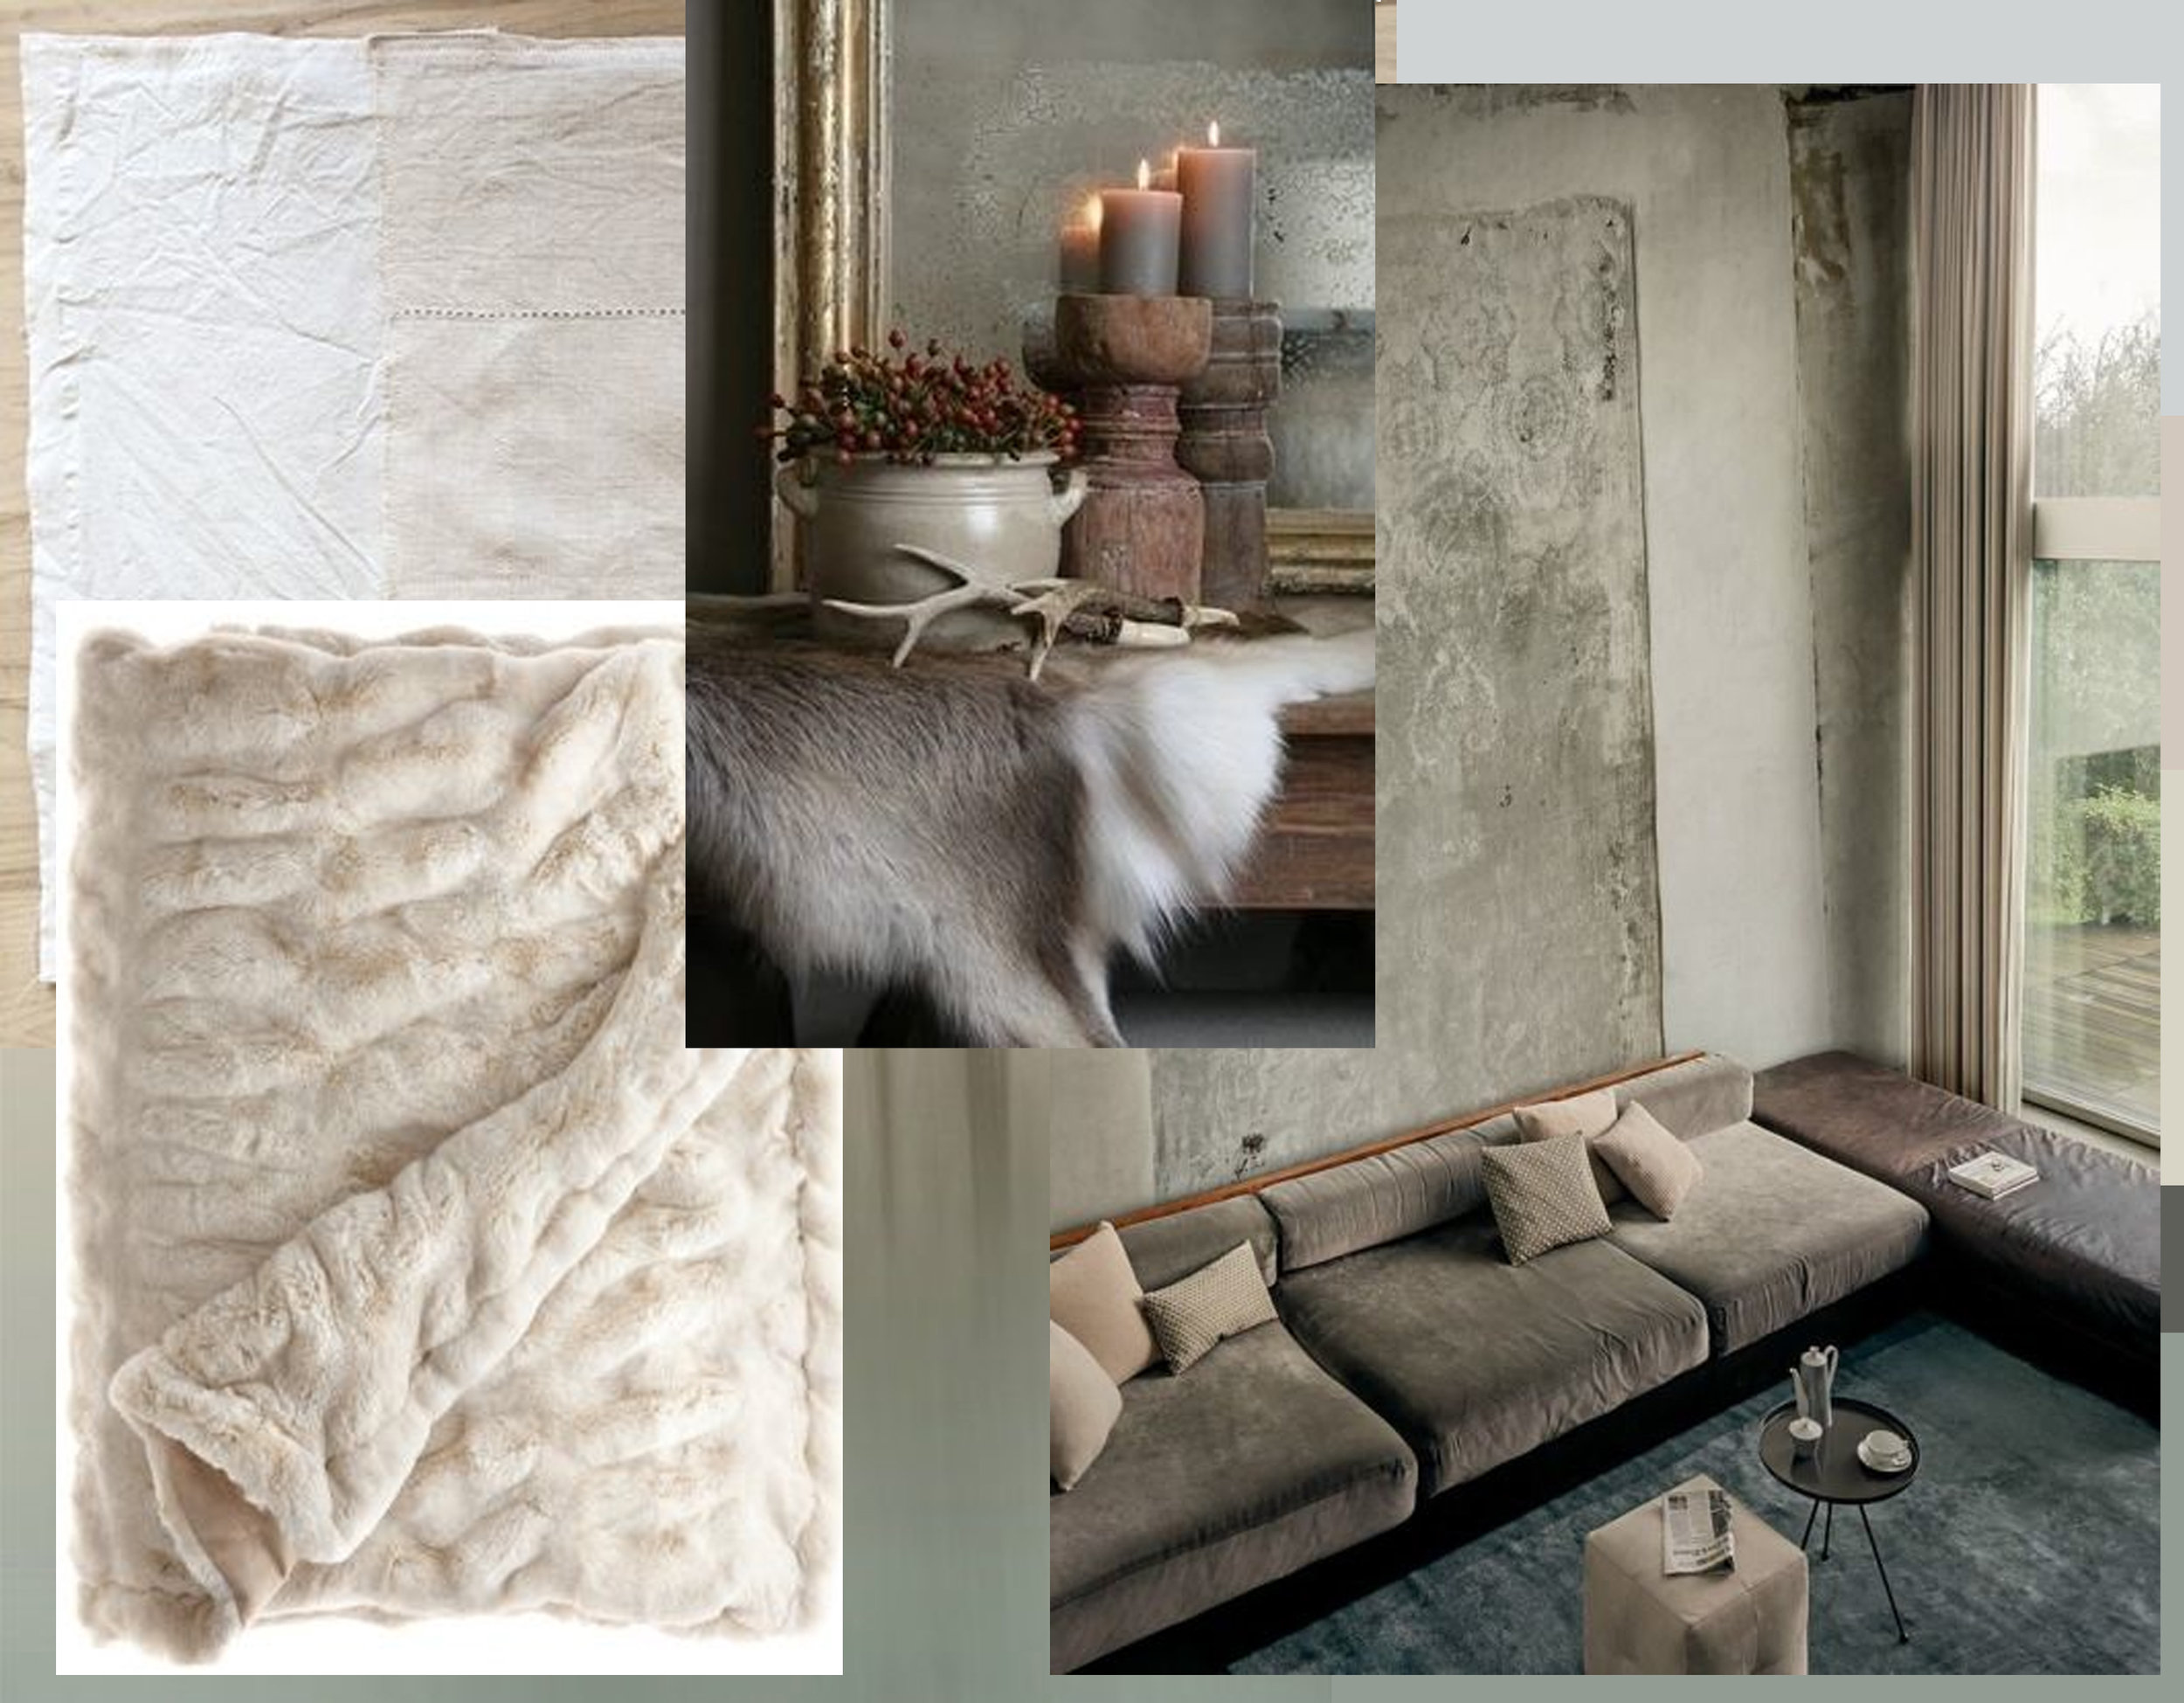 Patchwork Linens from Copenhagen via  Remodelista  - faux-fur throw  Pop Sugar  - cosy winter decoration via  Oak Furnitureland  - interior image via  Feed Puzzle